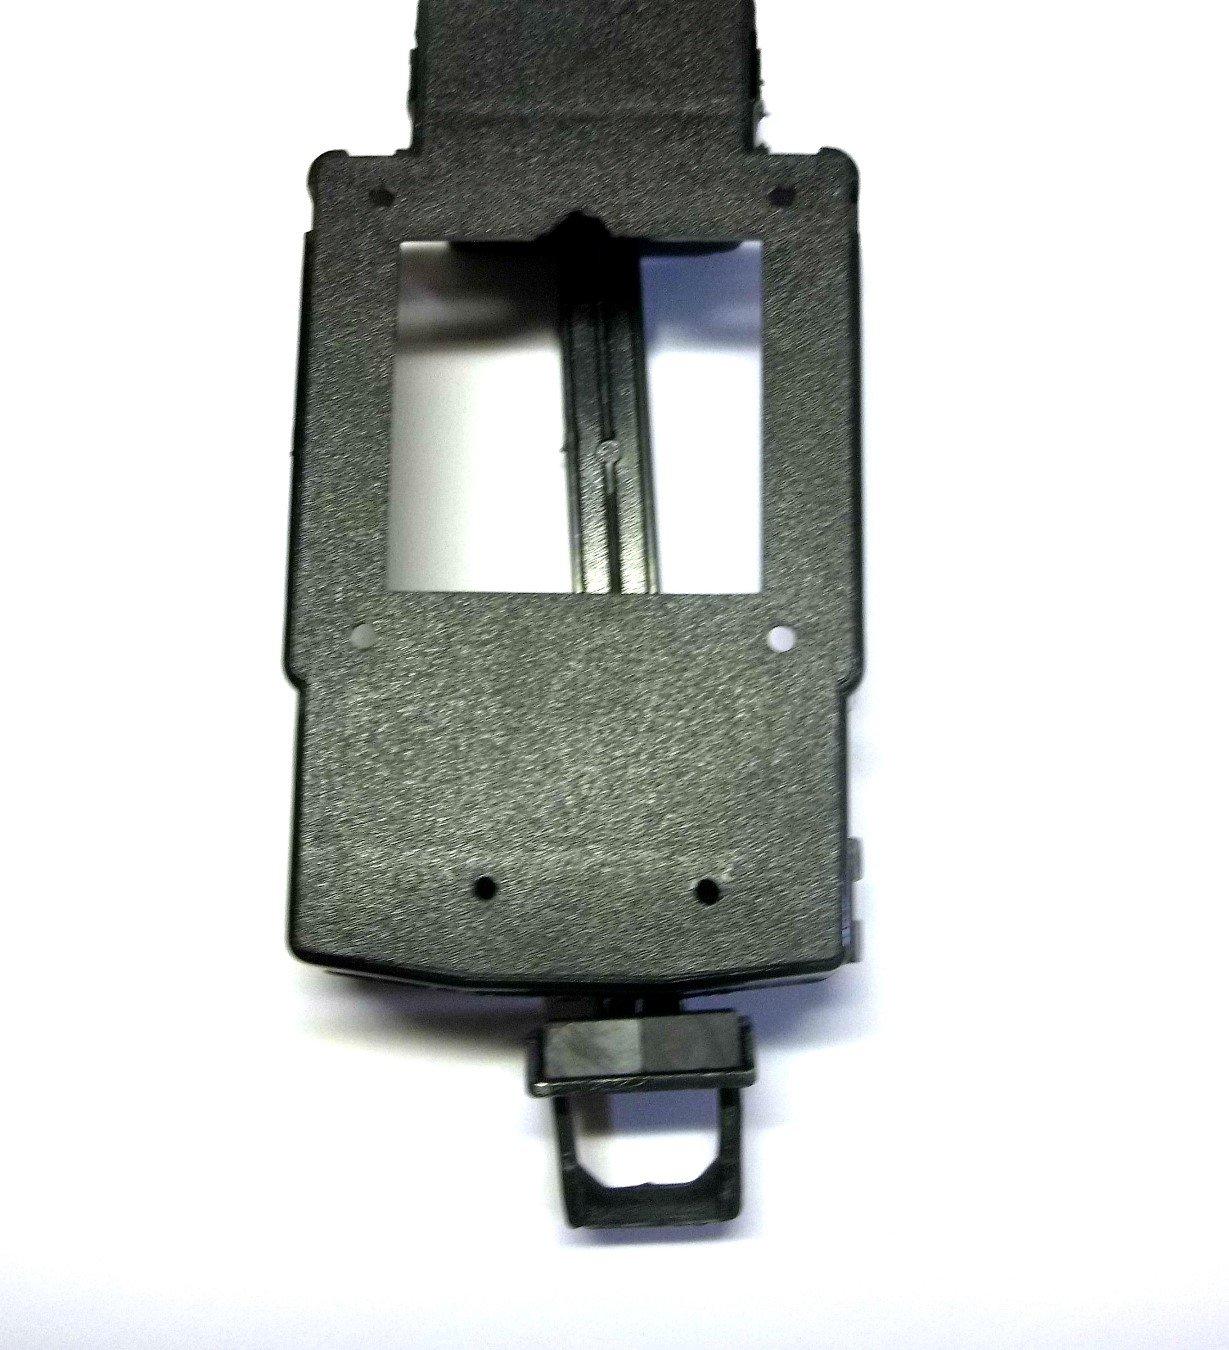 Pendulum Drive Unit Accepts Standard Mini Quartz Movements (PD01)